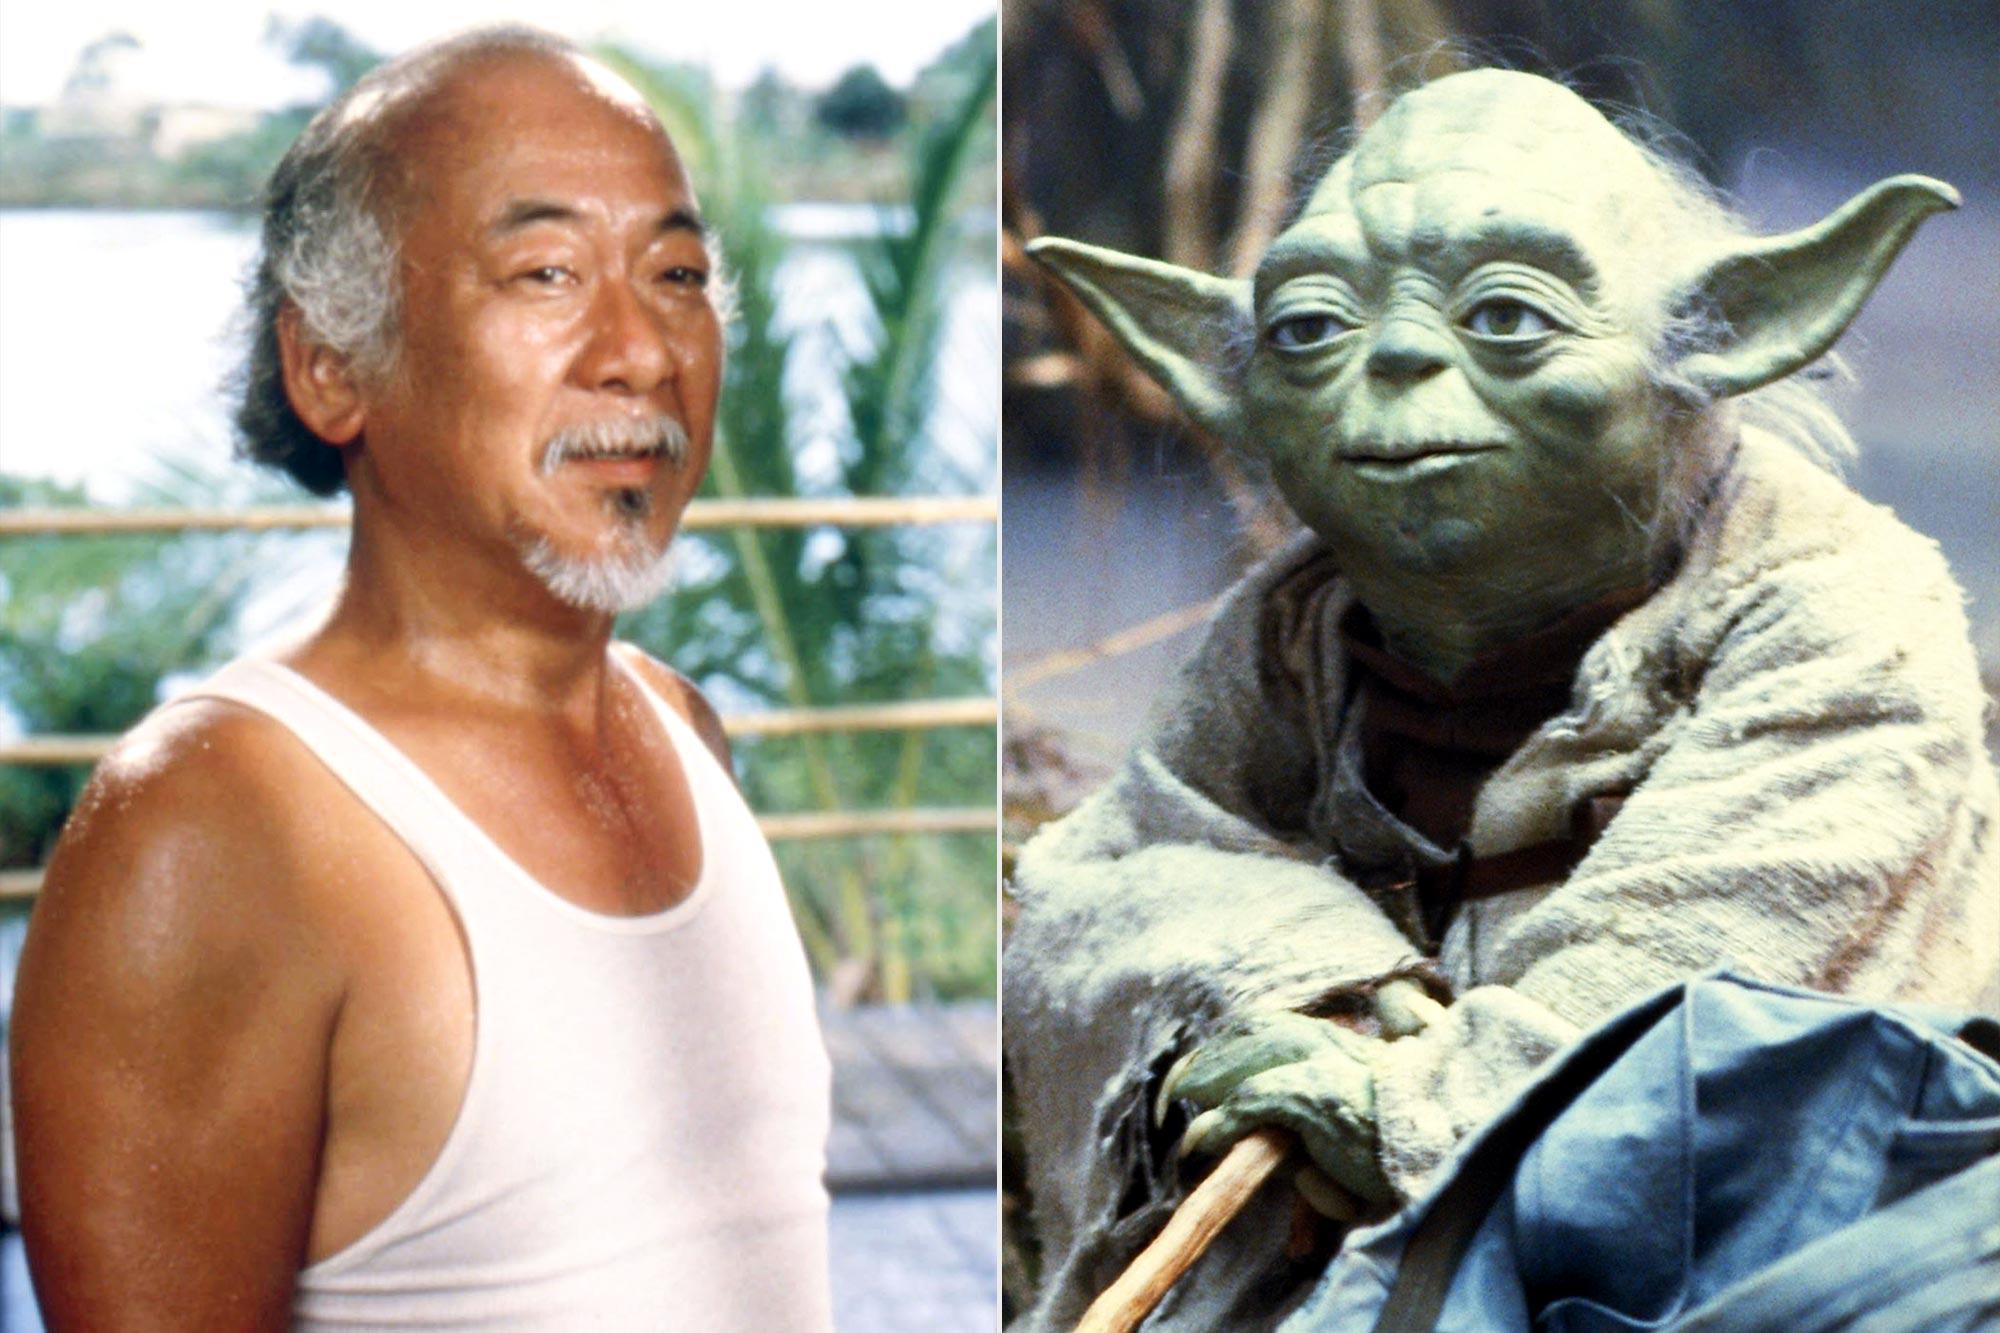 THE KARATE KID; Empire Strikes Back Yoda